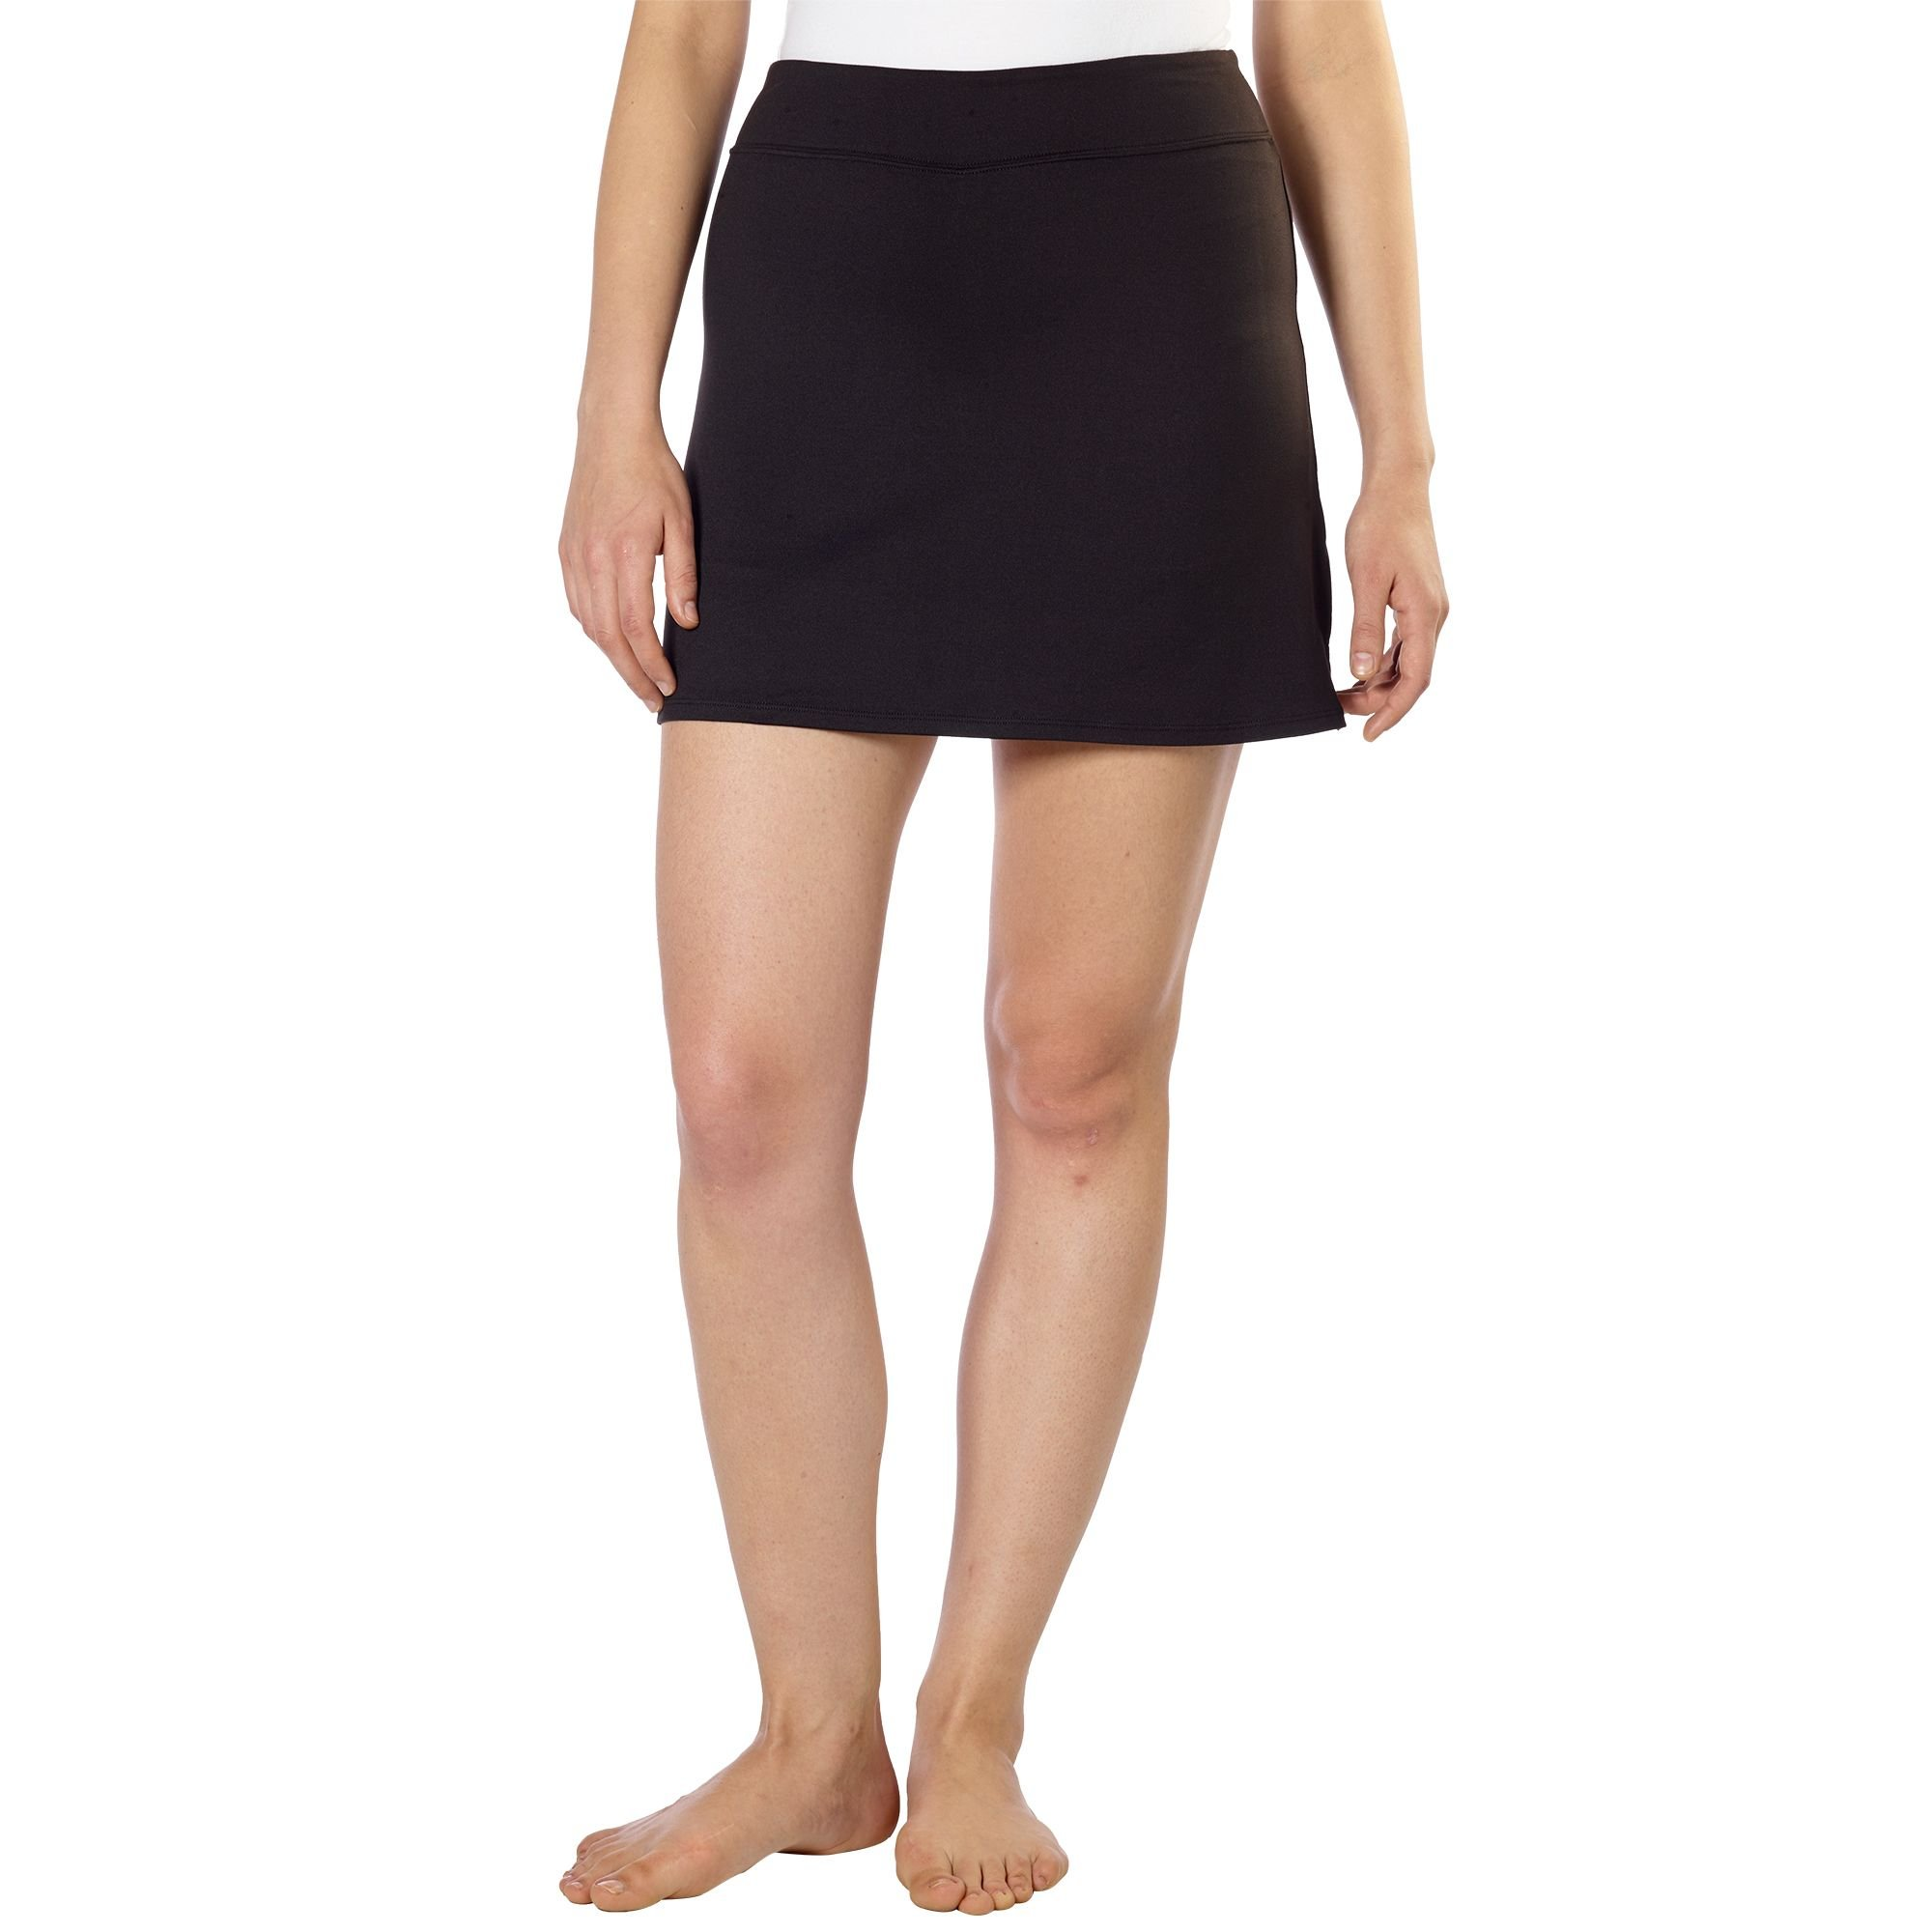 Colorado Clothing Women's Tranquility Skort, Black, Medium